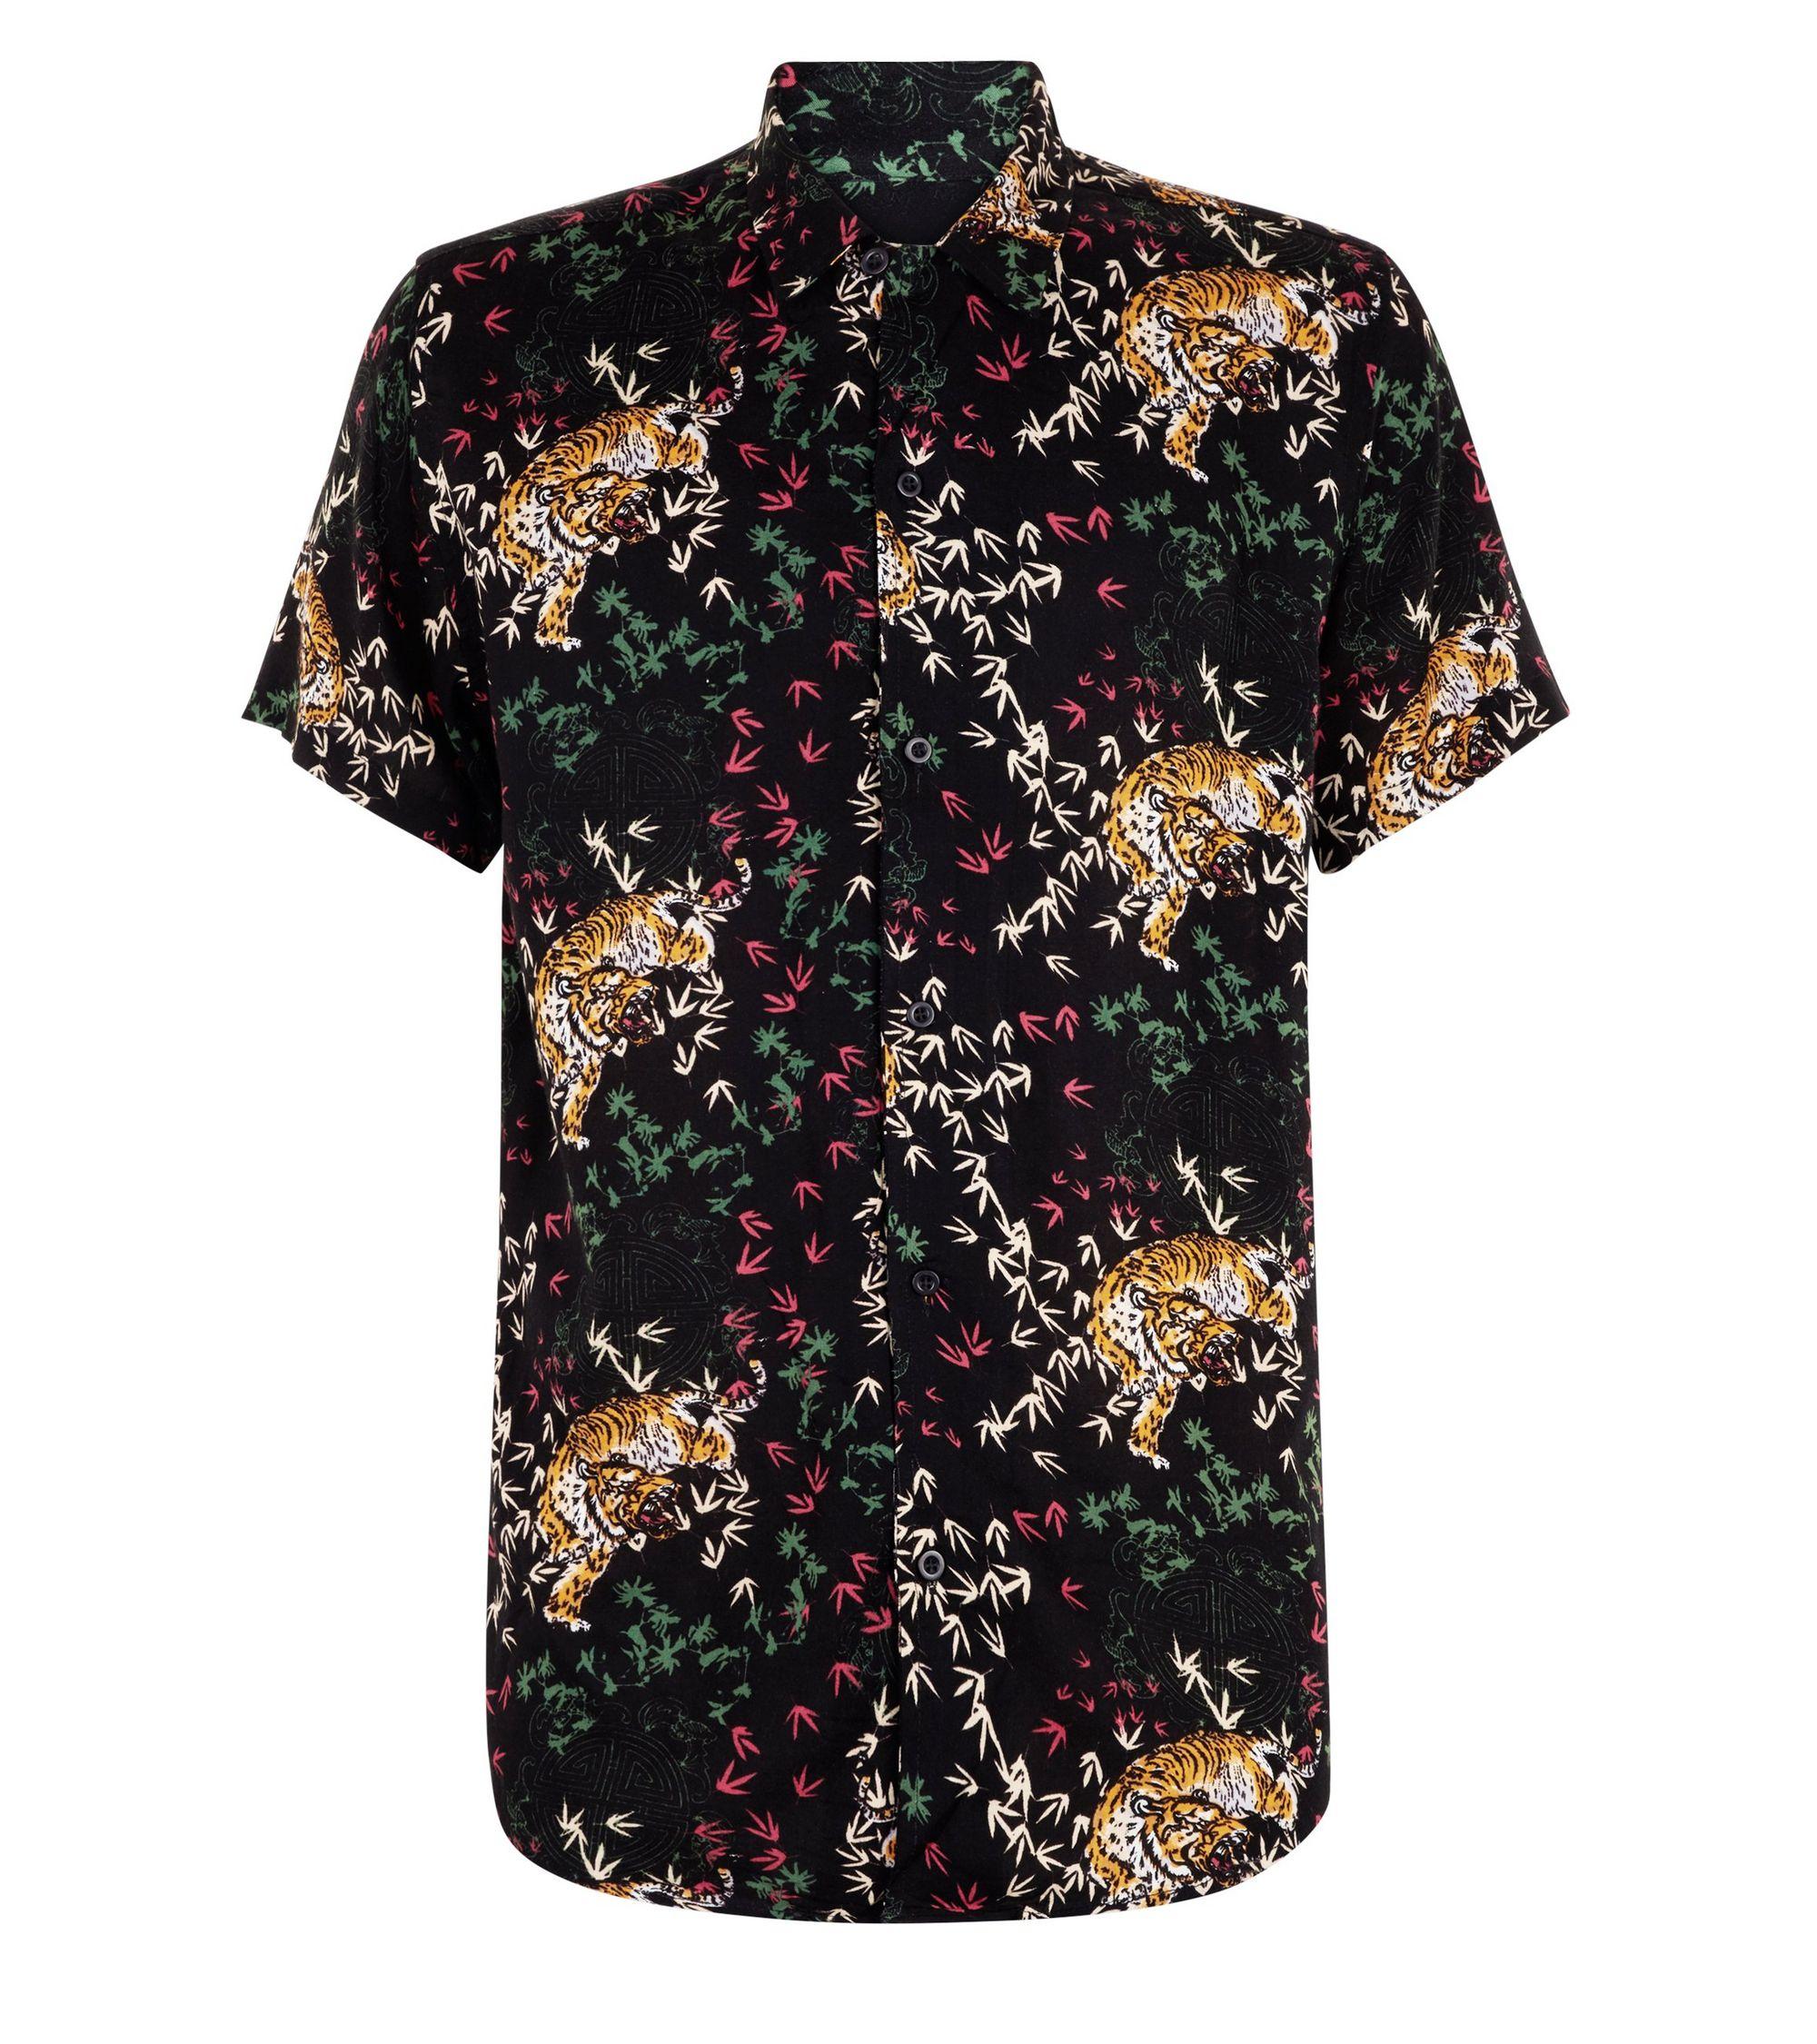 New Look Black Tiger Print Button Through Short Sleeve Shirt at ... 67c5eb146